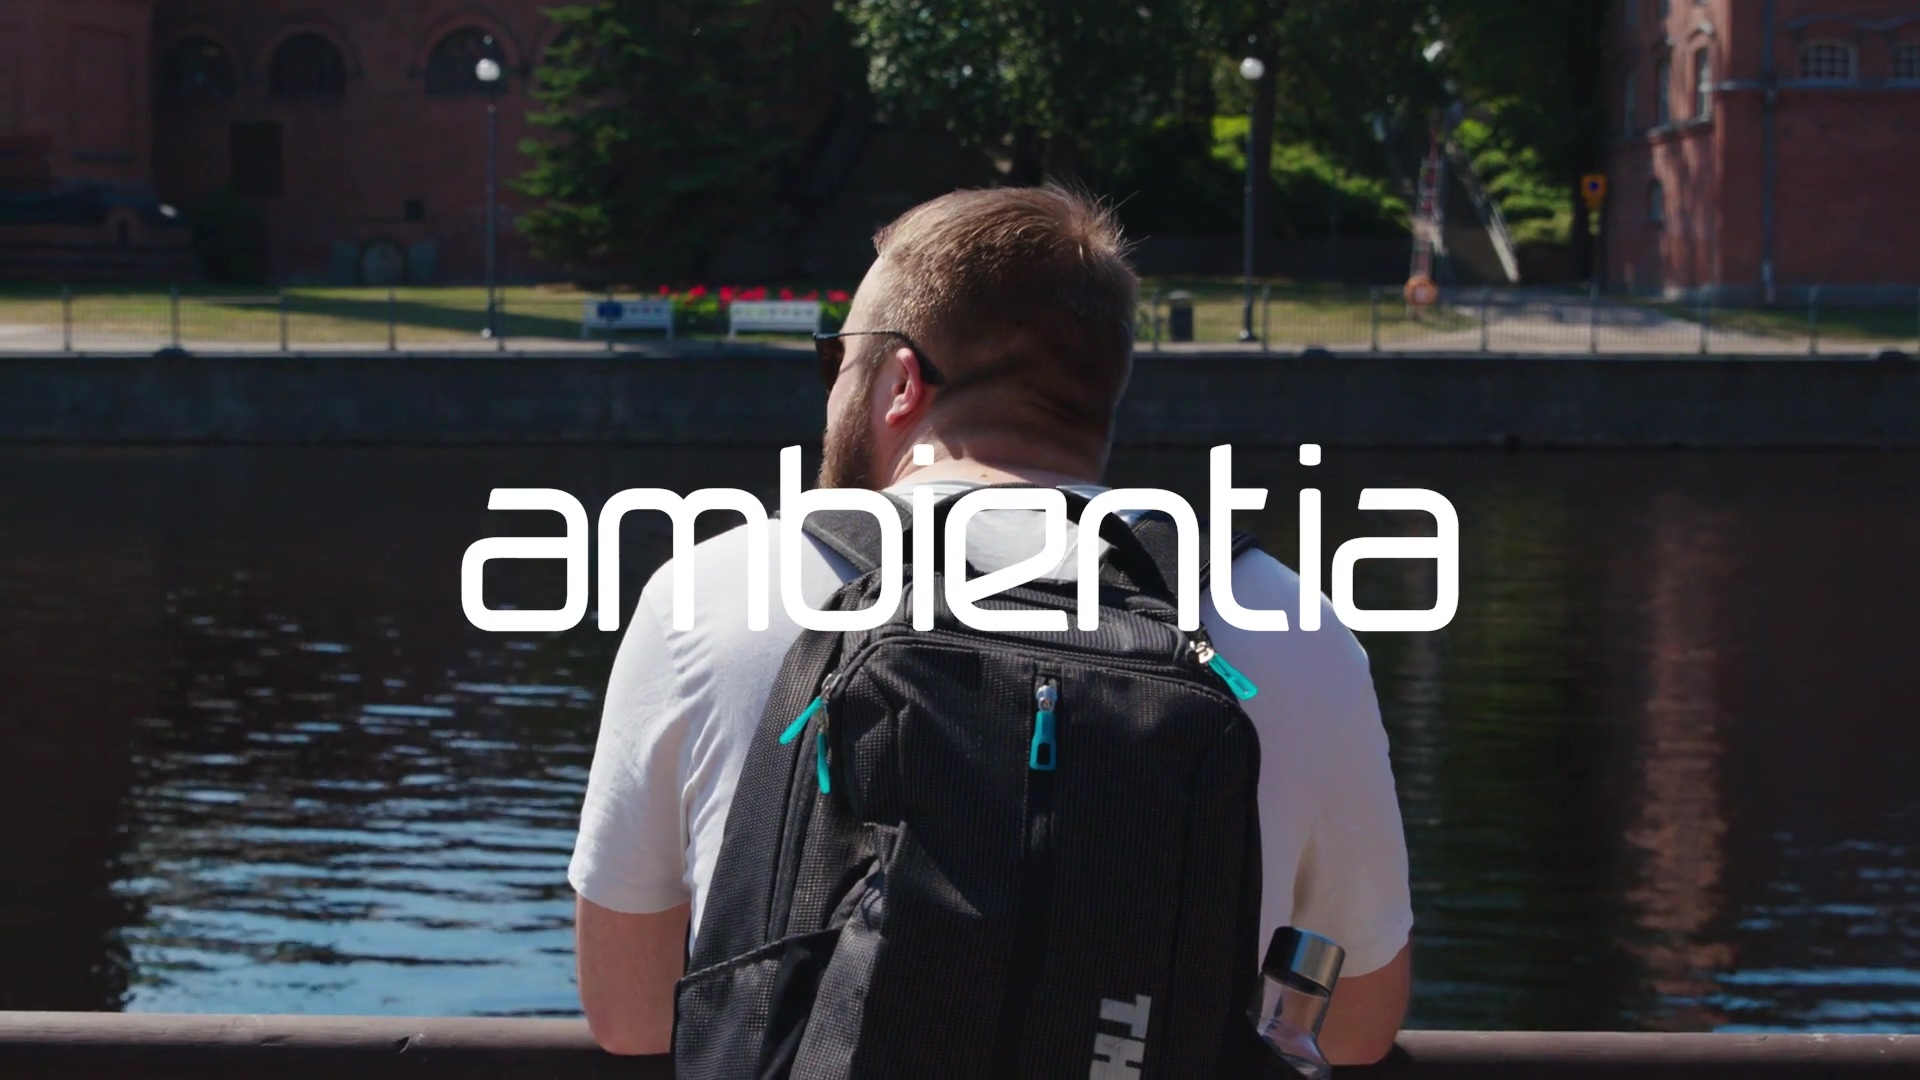 Ambientia - Joonas